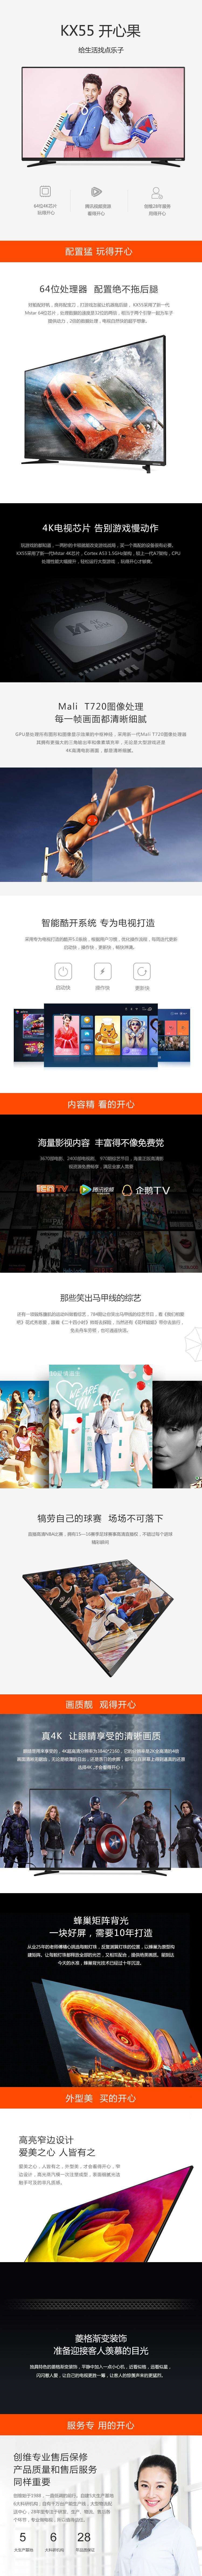 coocaa/酷开 KX55 55吋4K超高清网络智能LED平板液晶电视机